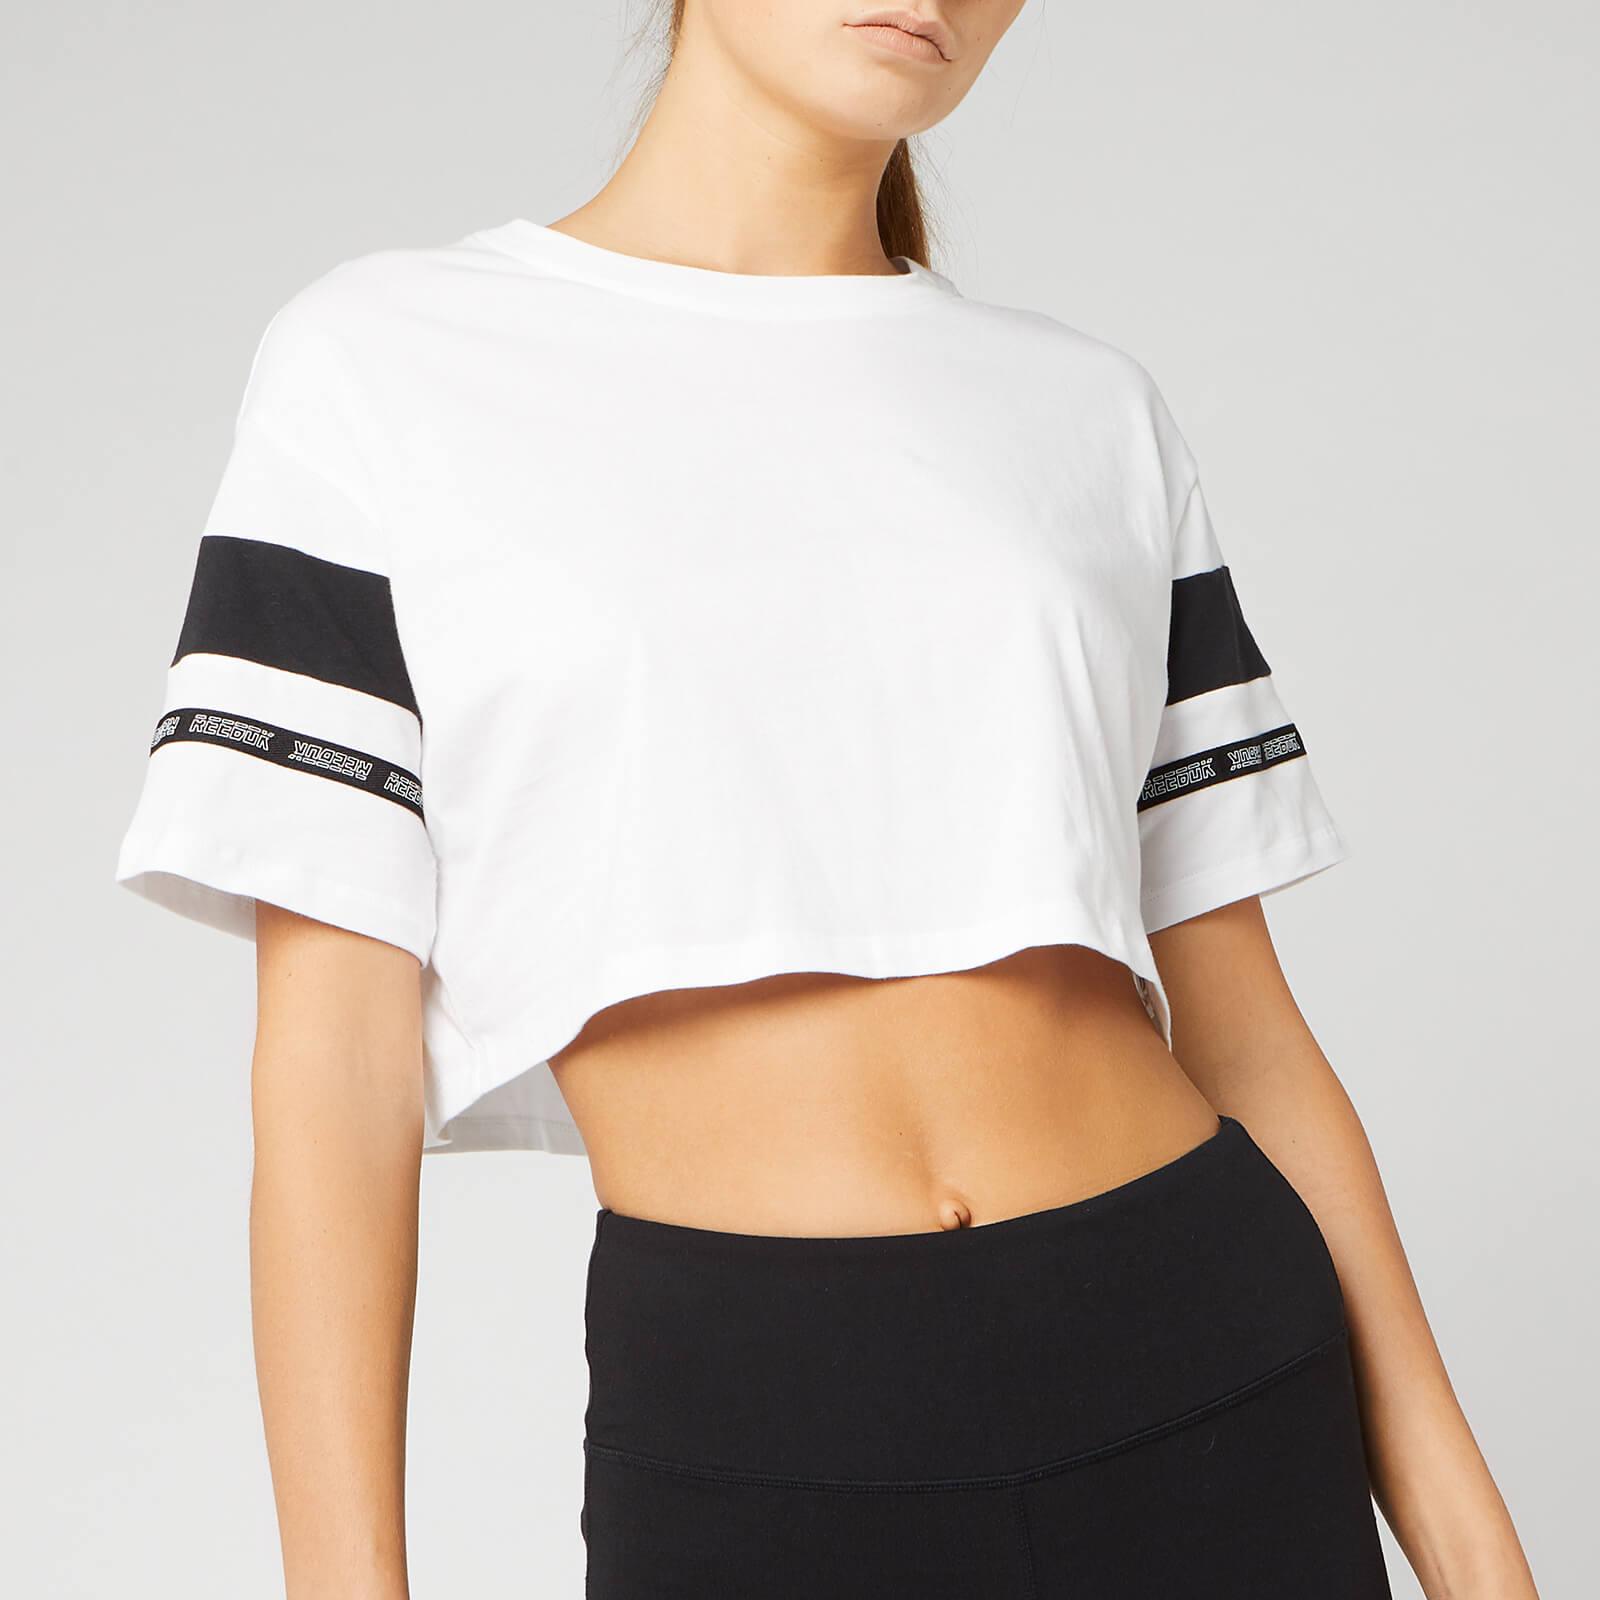 Reebok Women's WOR MYT Solid Cropped Short Sleeve T-Shirt - White - S - White